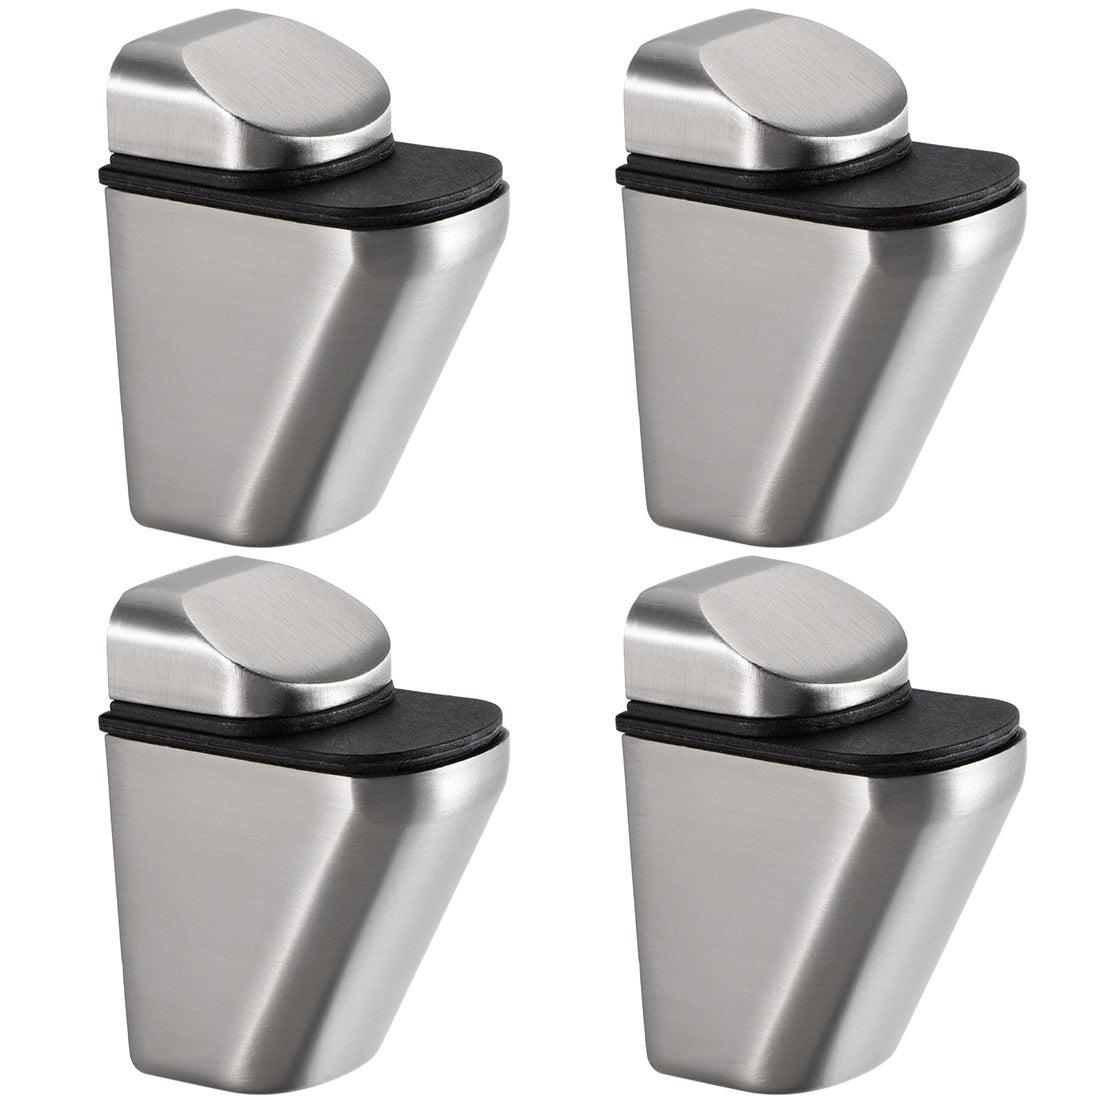 F Shape Adjustable Zinc Alloy Glass Shelf Clamp Bracket Brush Brass Tone 4 Pcs